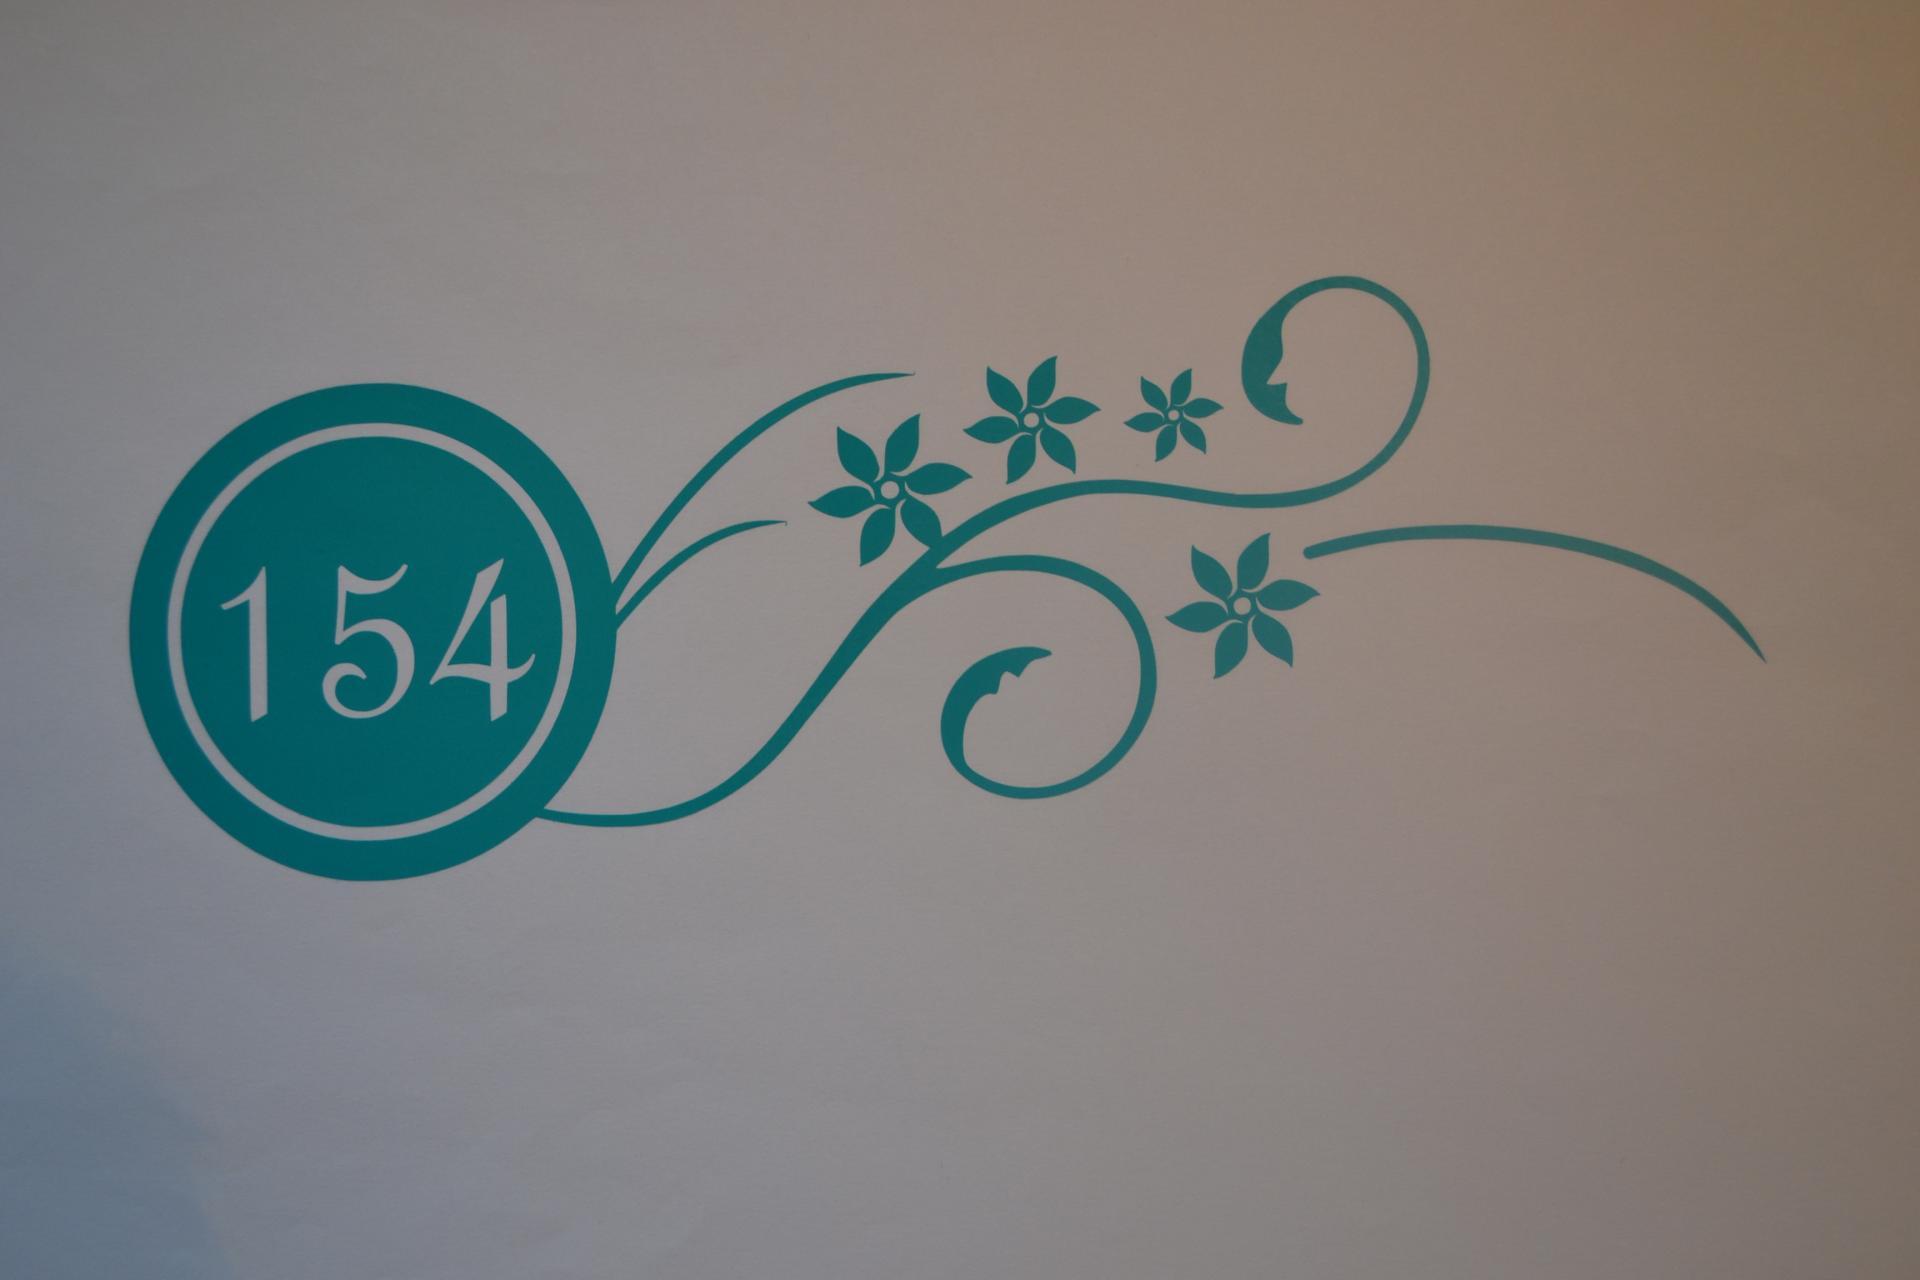 Sticker boites aux lettres numero fleurs 2